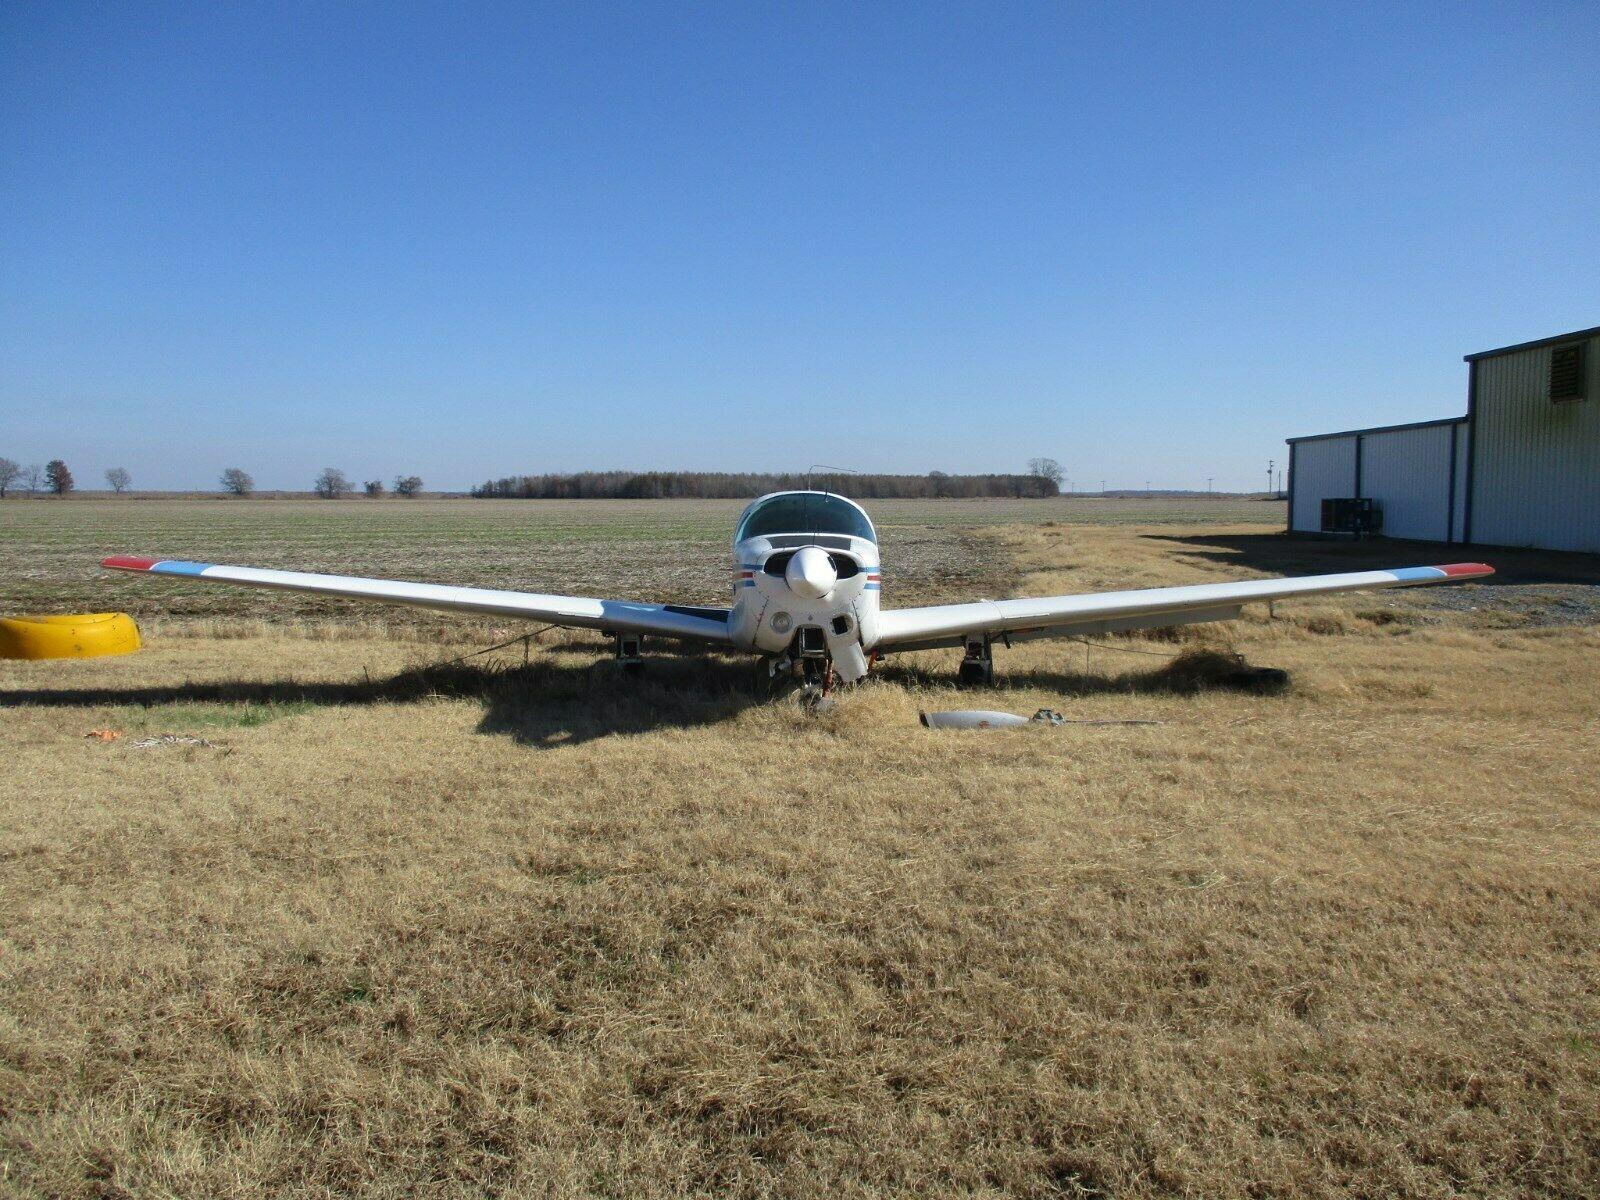 needs TLC 1964 Mooney M20c aircraft for sale